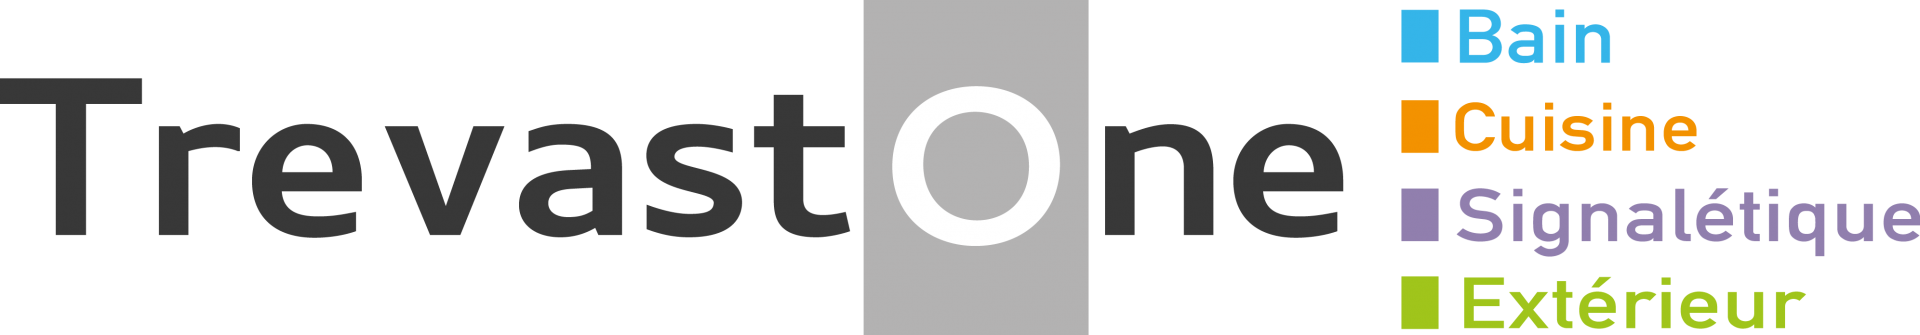 1 logo trevastone details 1